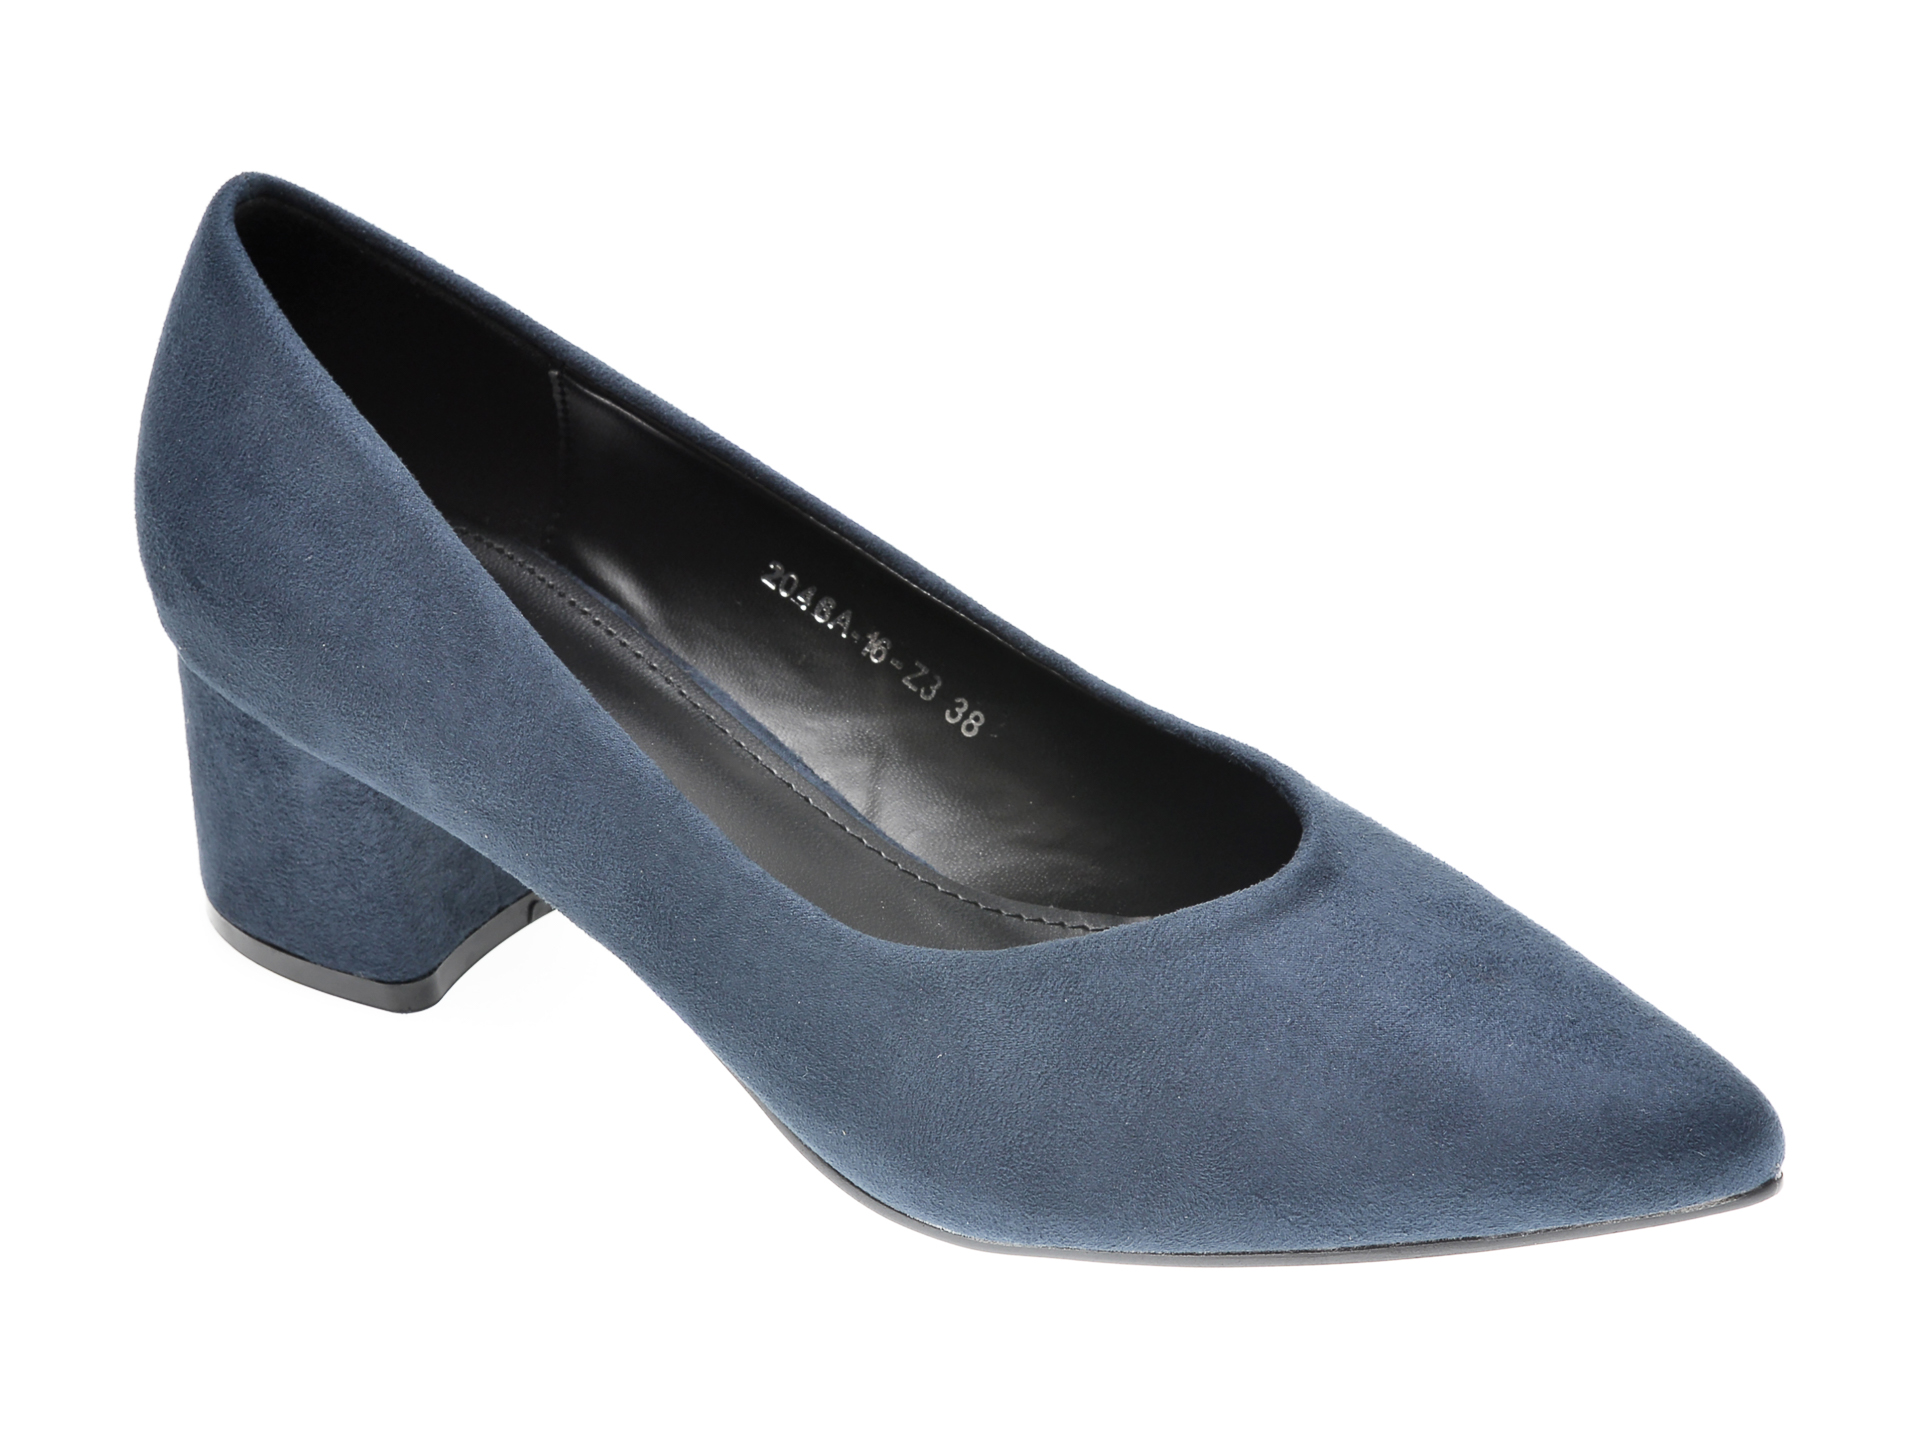 Pantofi RIO FIORE bleumarin, 2046A, din piele ecologica imagine